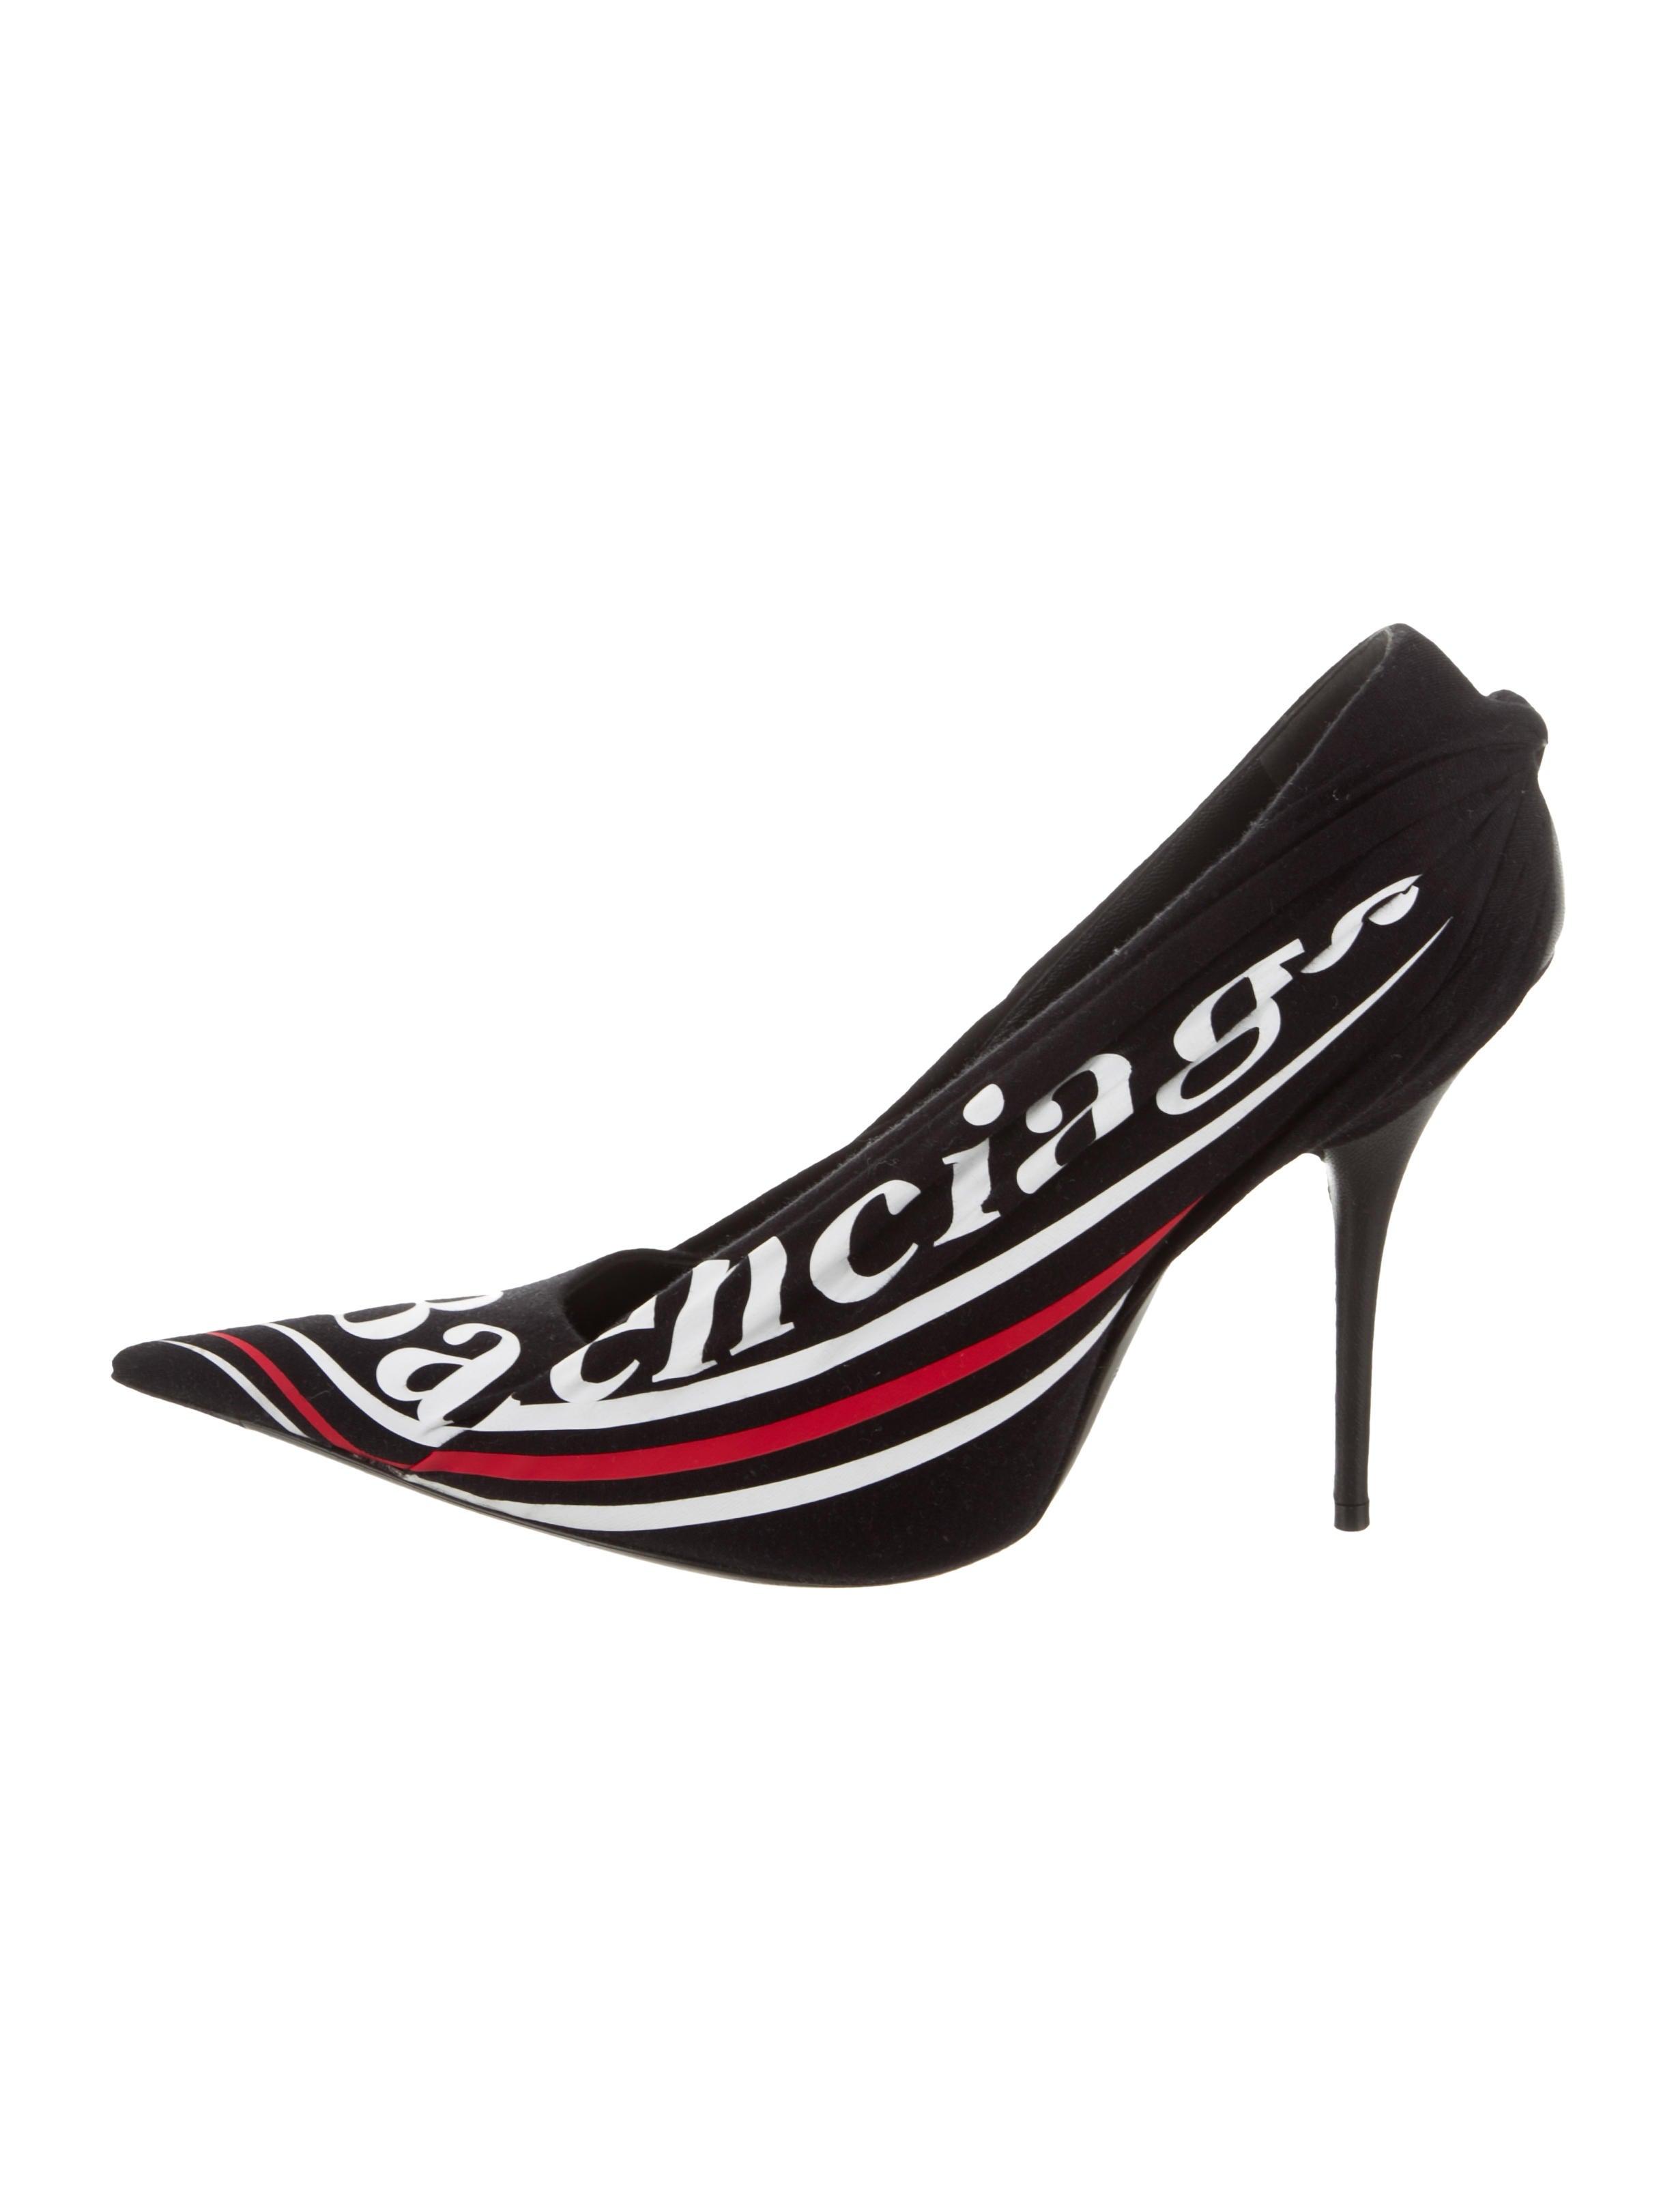 69600b7d63a9 Balenciaga 2017 Logo Knife Pumps - Shoes - BAL73575